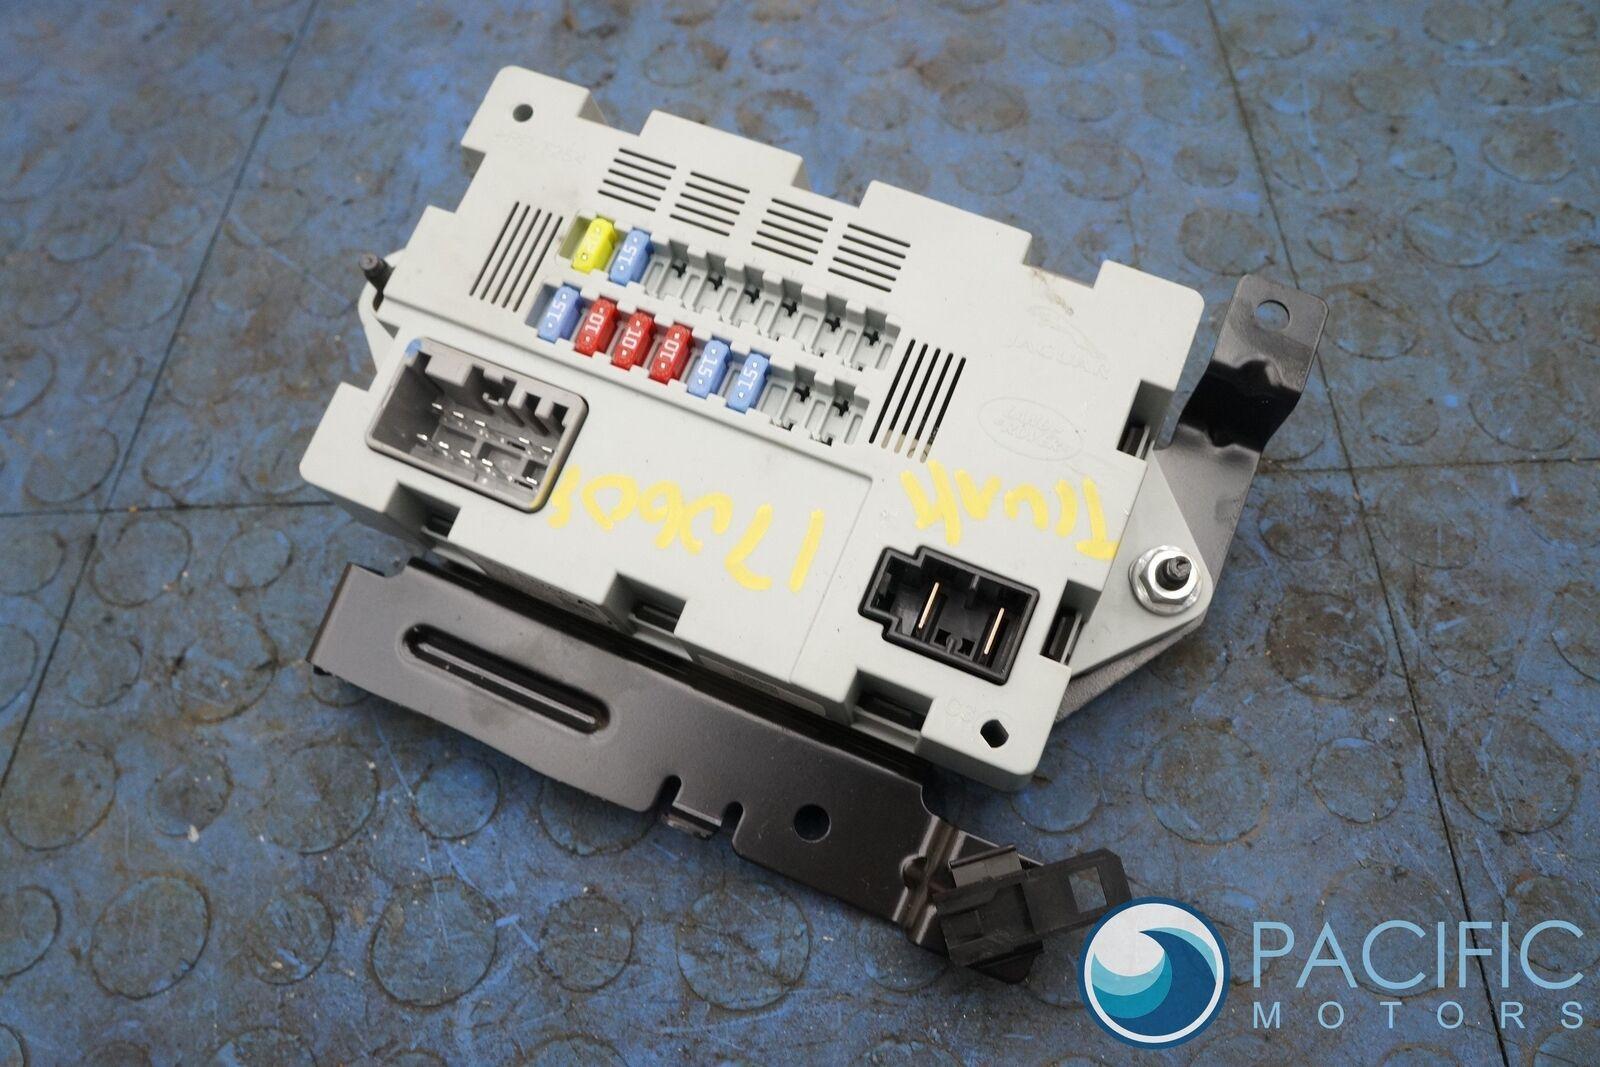 Engine Bay Compartment Fuse Box Block C2d23644 Jaguar F Type 2014 17